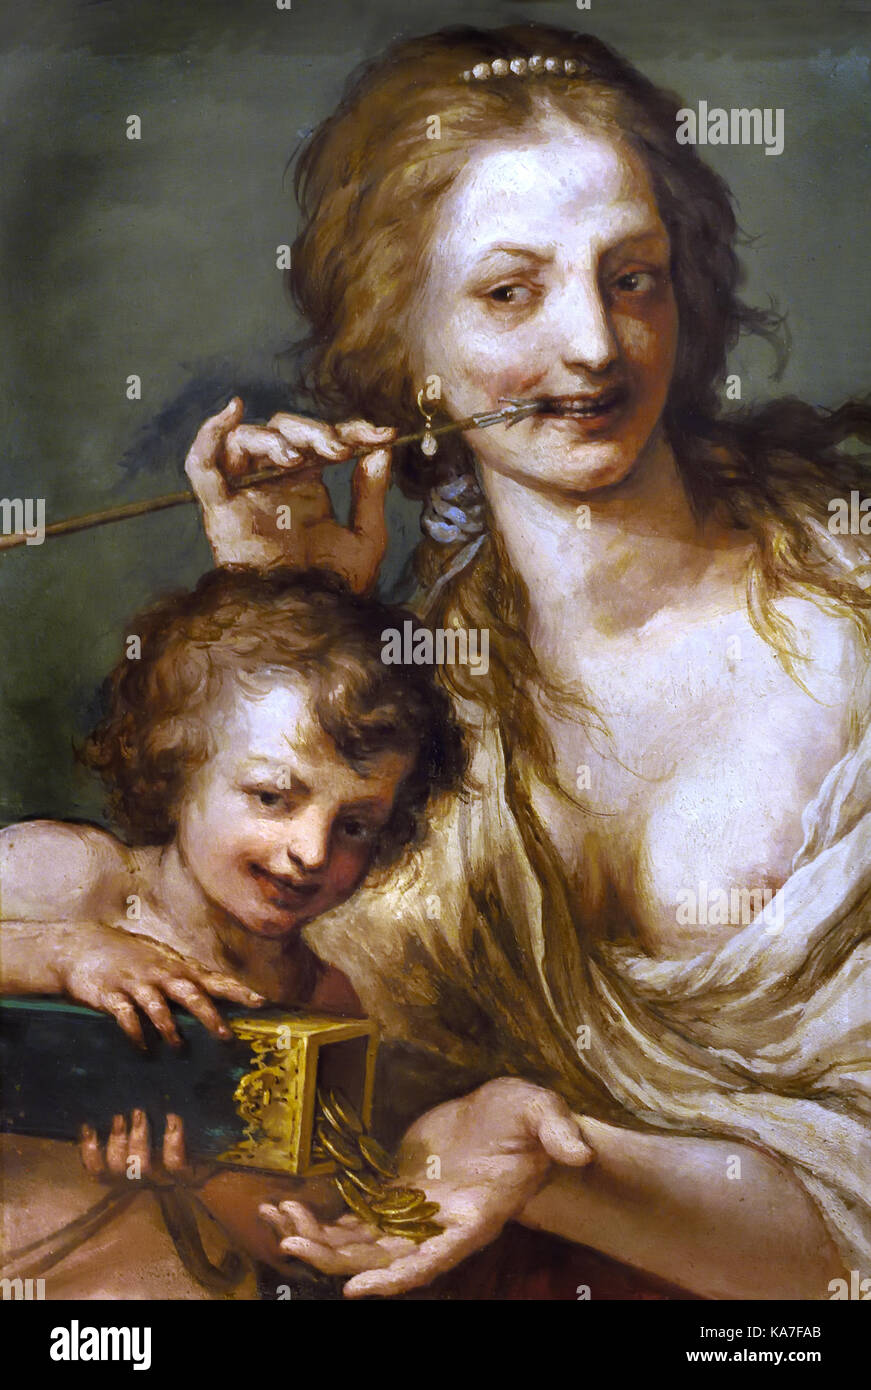 Amore venale - Vengeance by Baldassarre Franceschini 1611 - 1689 Florence Italy - Stock Image